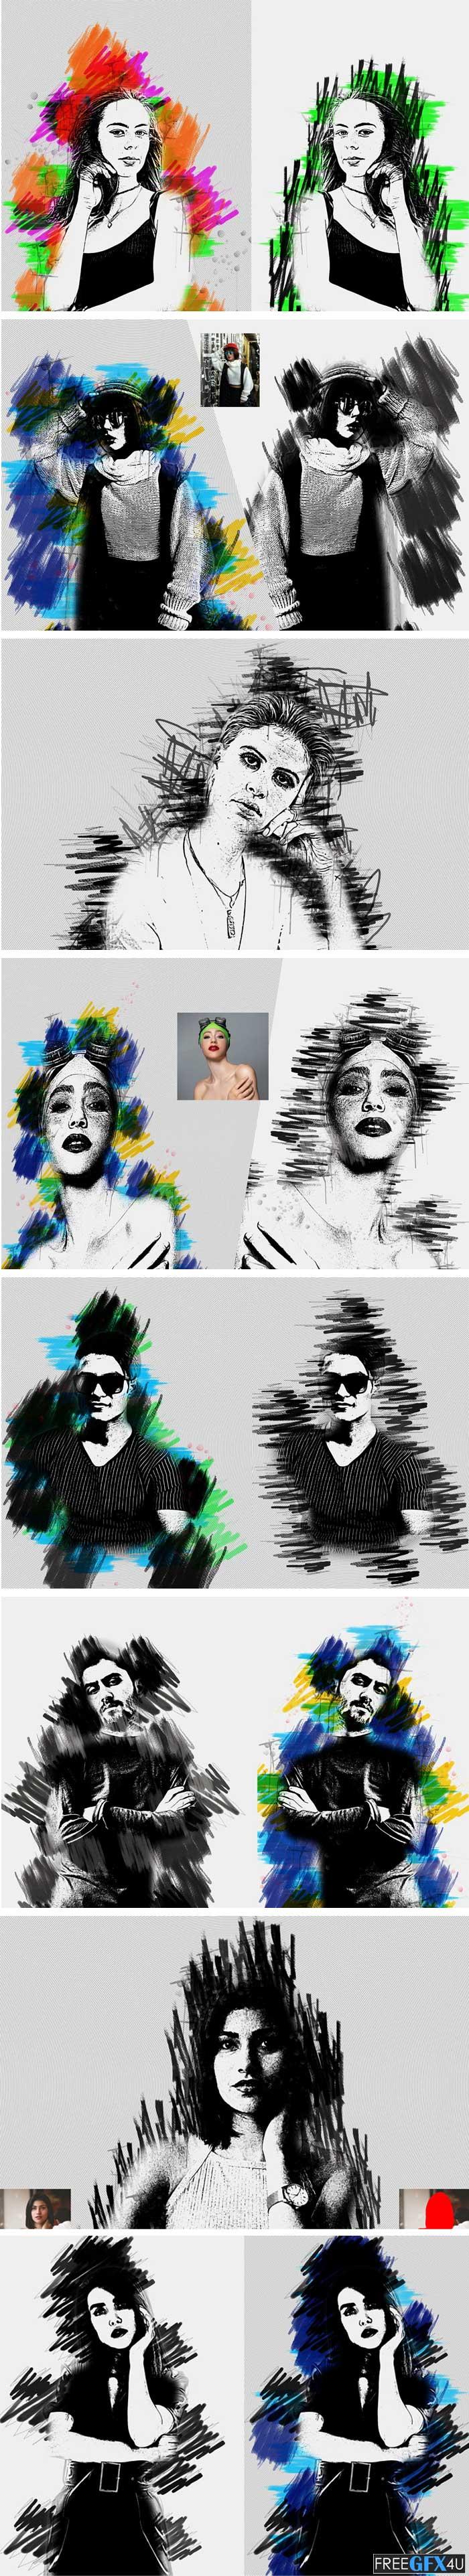 Marker Art Photoshop Action